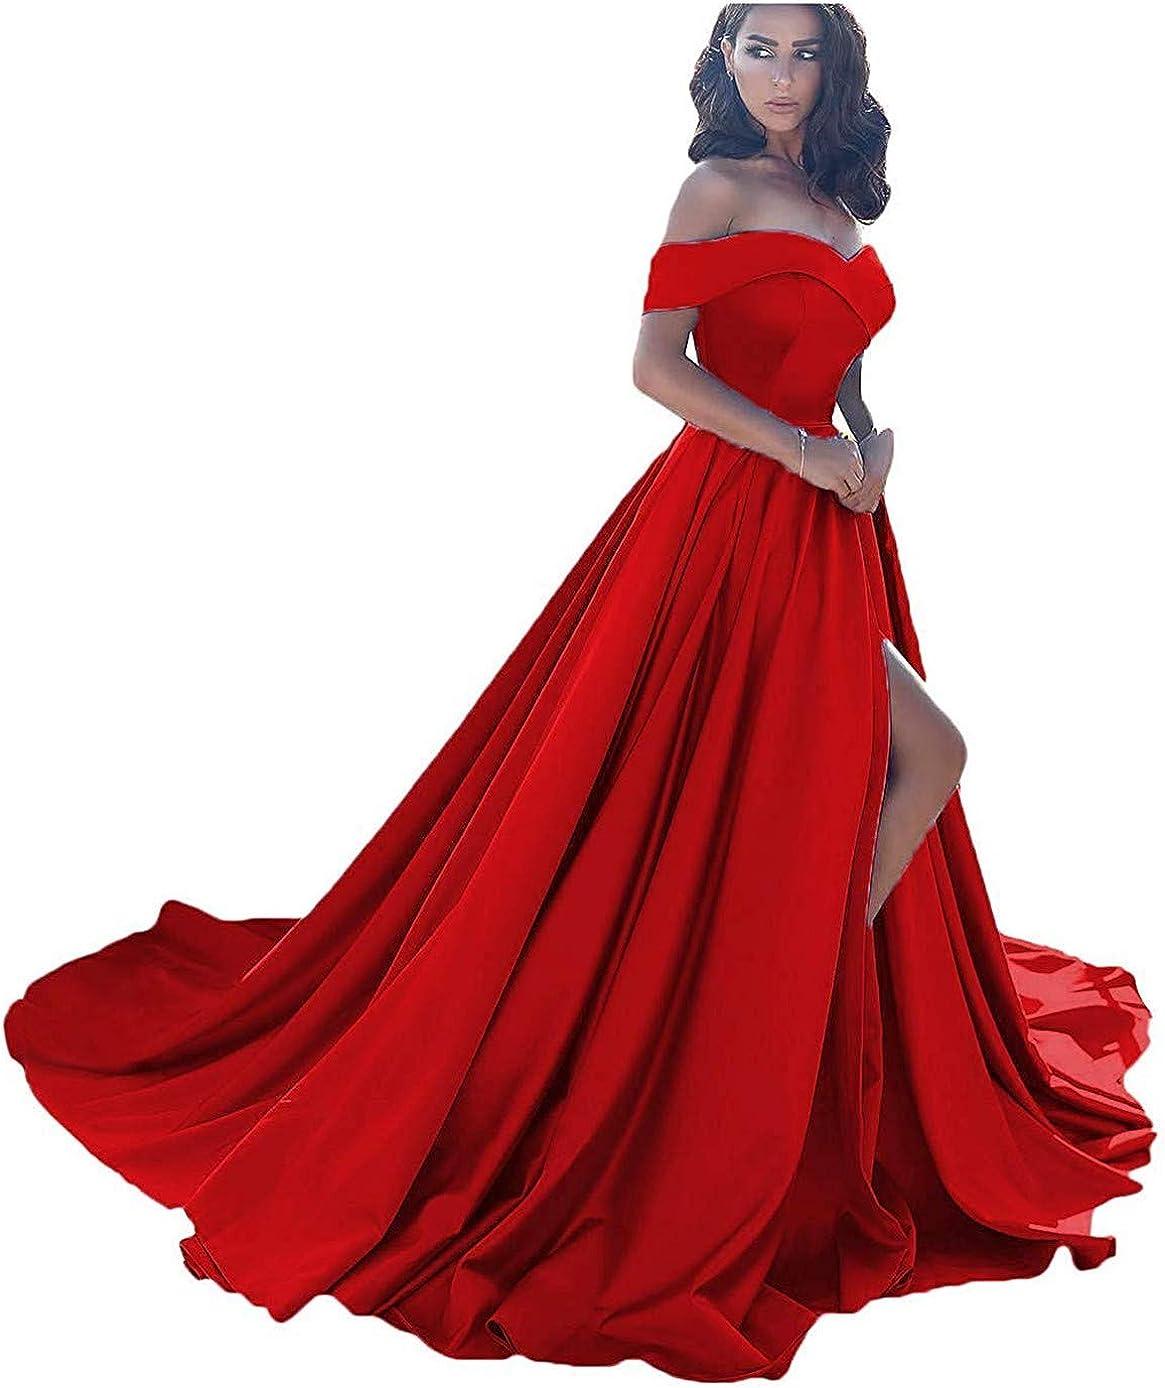 ANGELWARDROBE Women's Off Shoulder Formal Ball Gown Long with Slit Prom Dresses Satin Wedding Dress